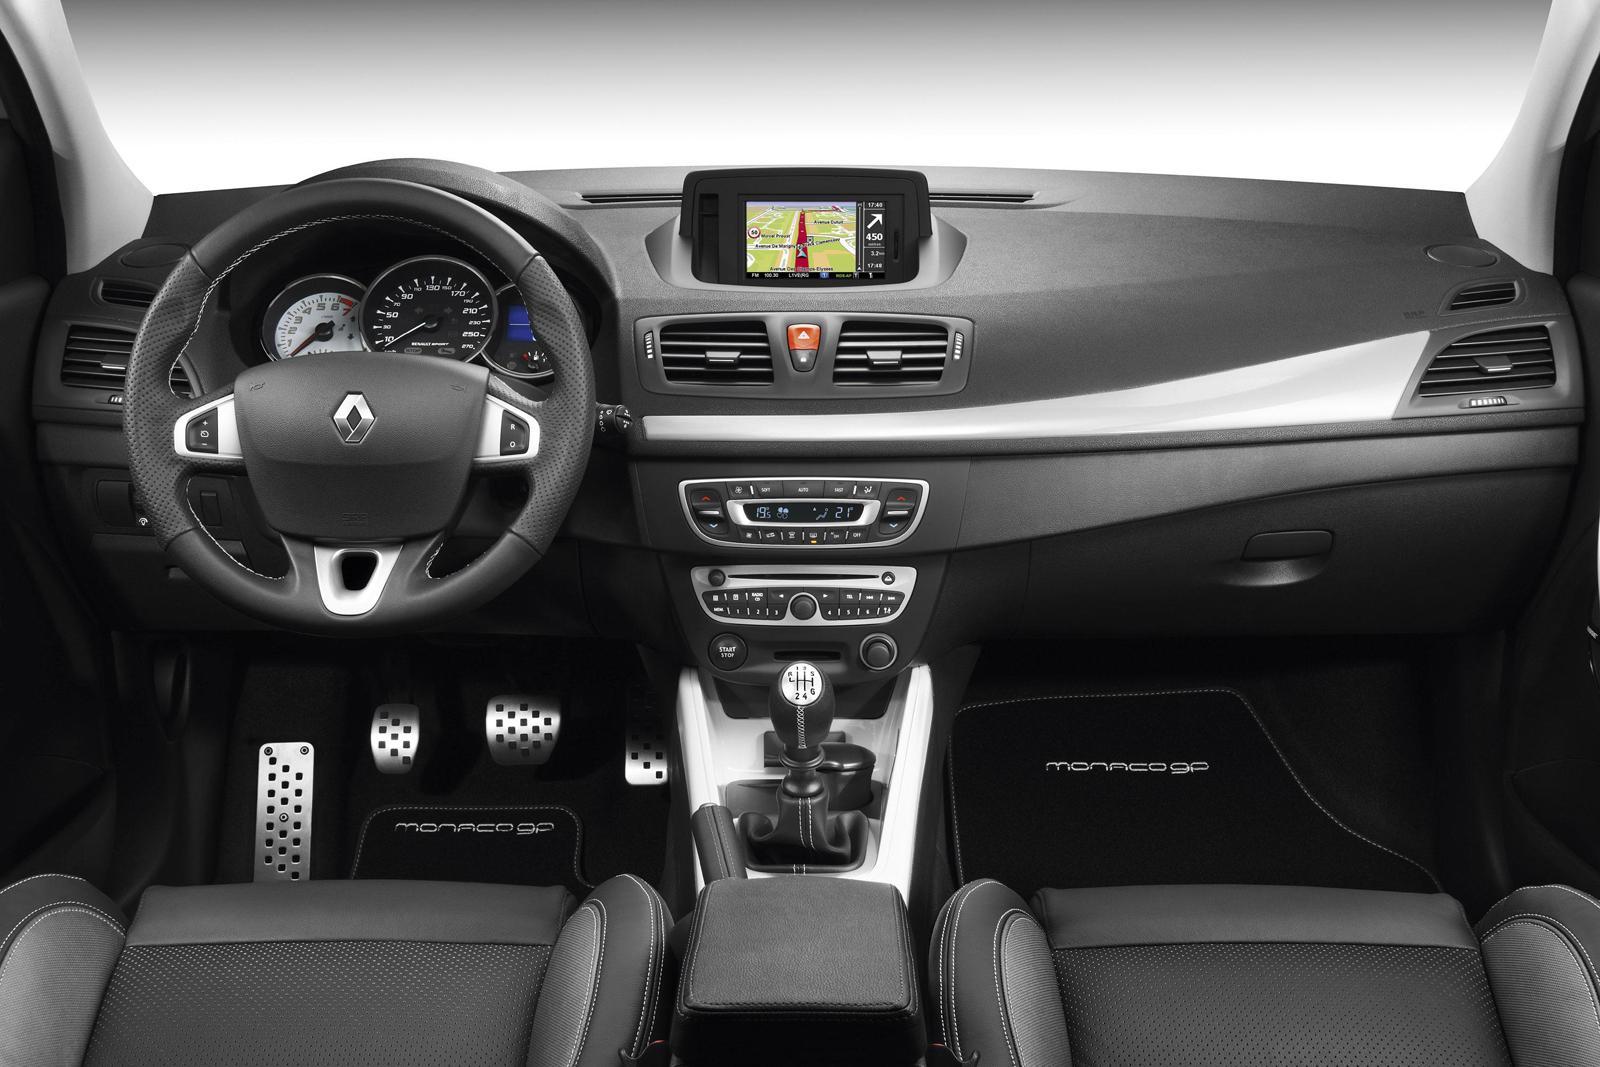 Renault Megane Coupe Monaco GP - Picture 48824